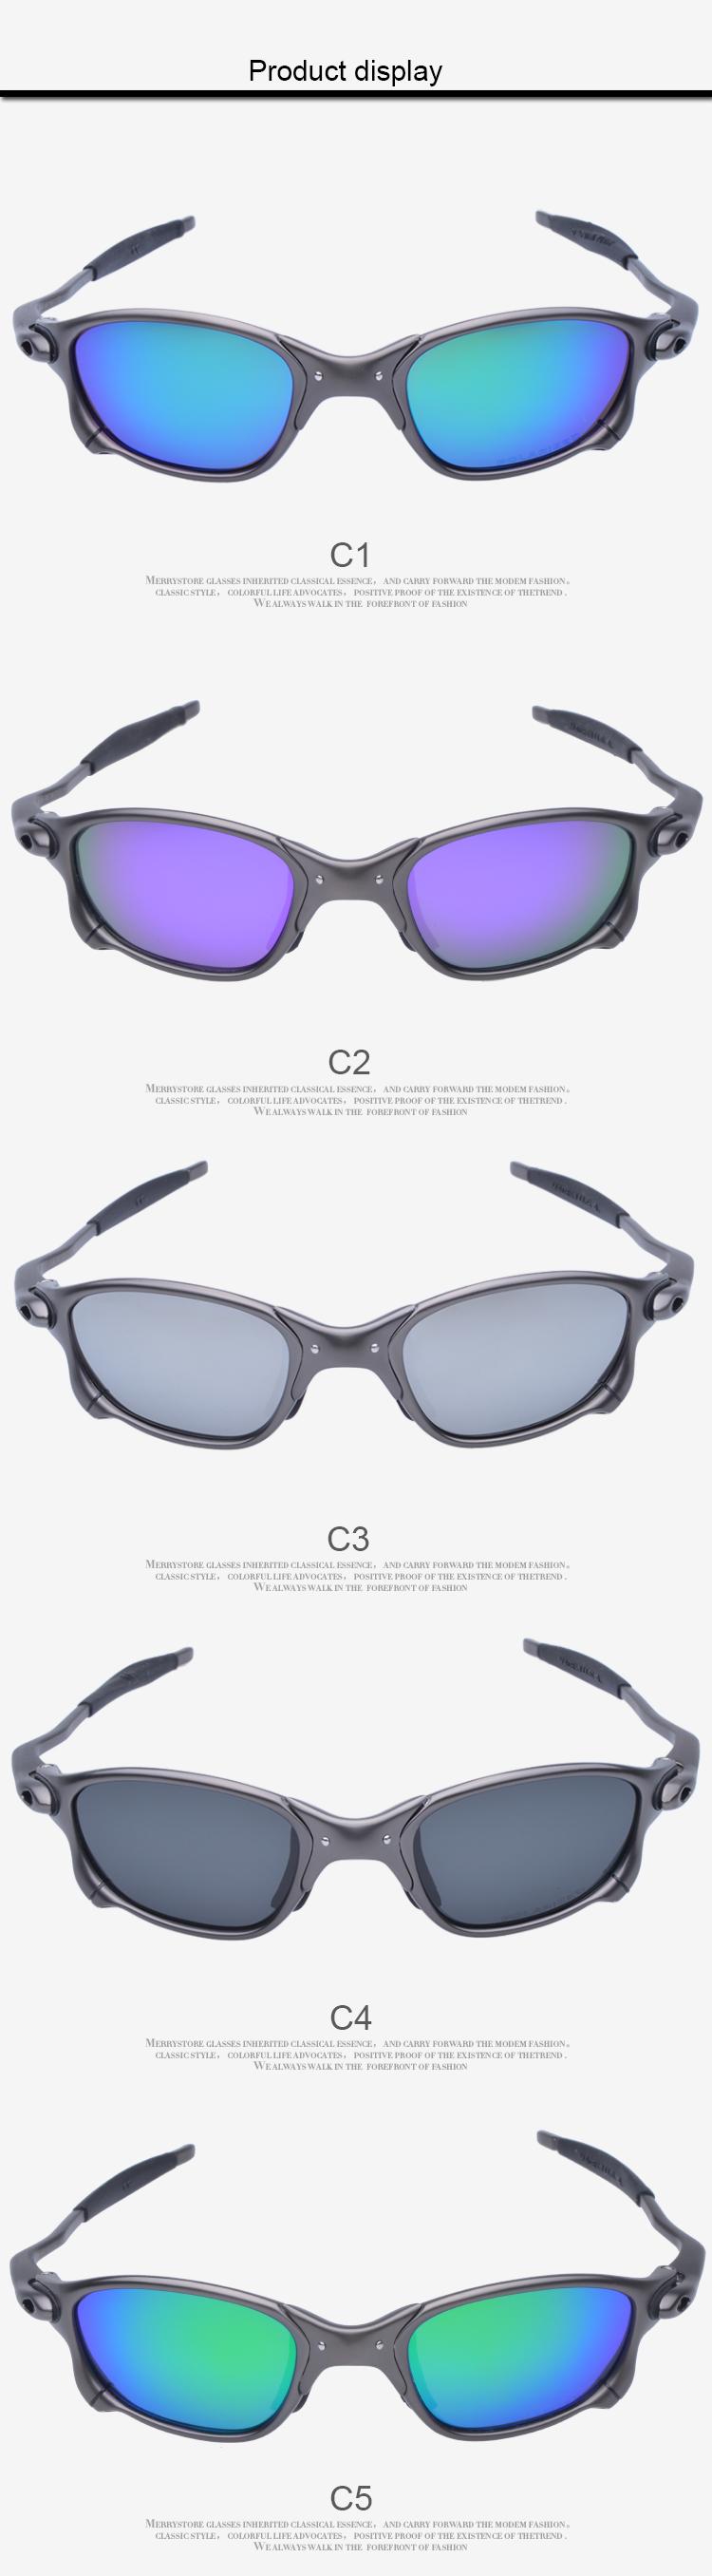 X Metal Juliet Cyclops Sunglasses Uv 400 Ruby Polarized Glass Titanium Goggles